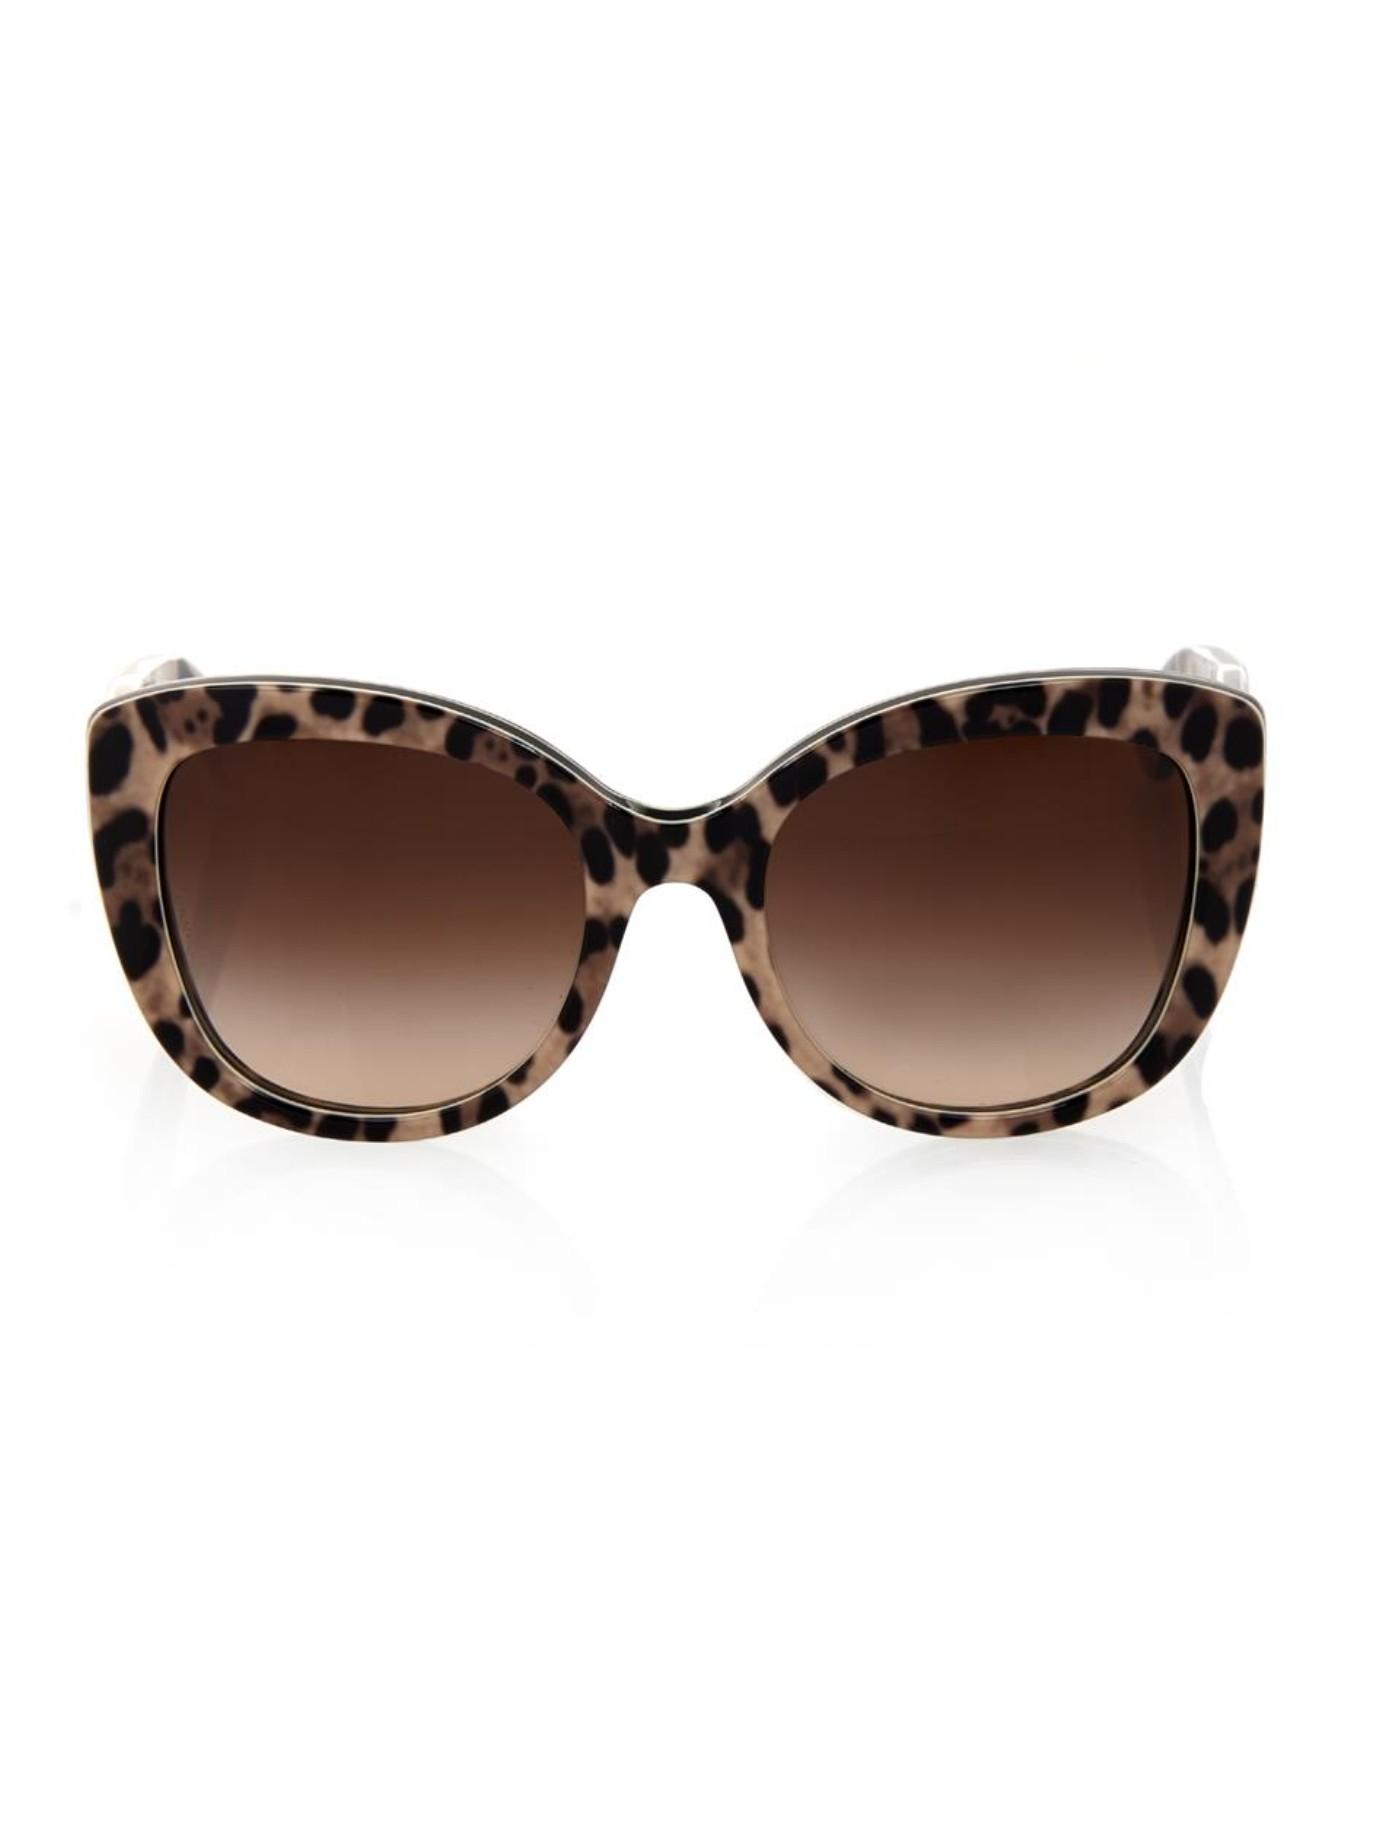 Leopard Print Cat Eye Sunglasses